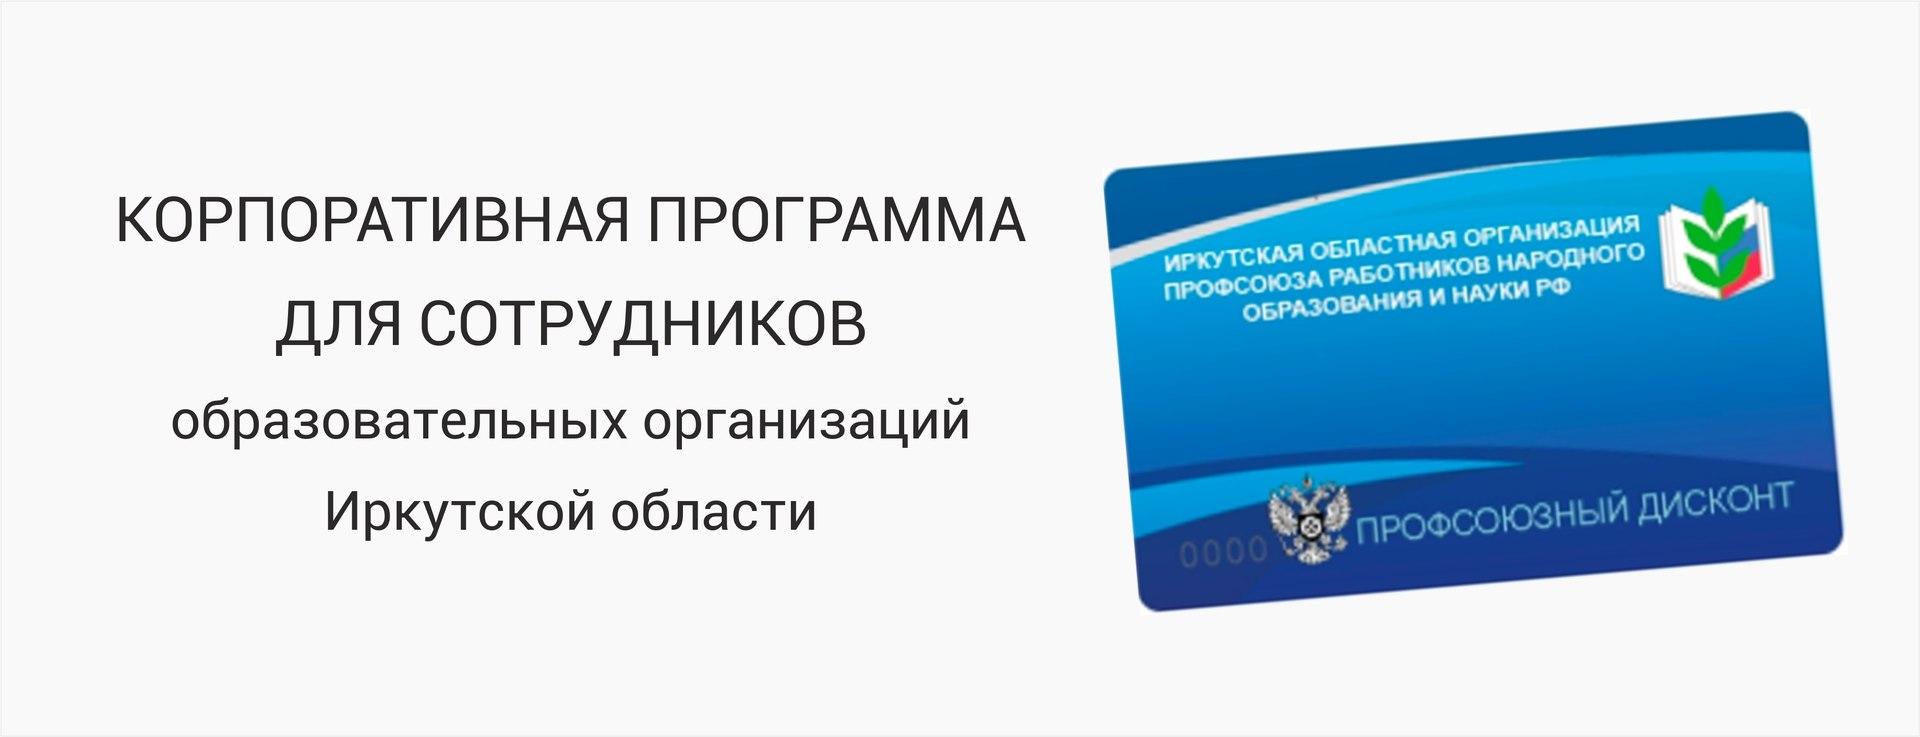 https://www.almazcom.ru/pub/img/QA/loyaltyprogram/02.09.2016.jpg